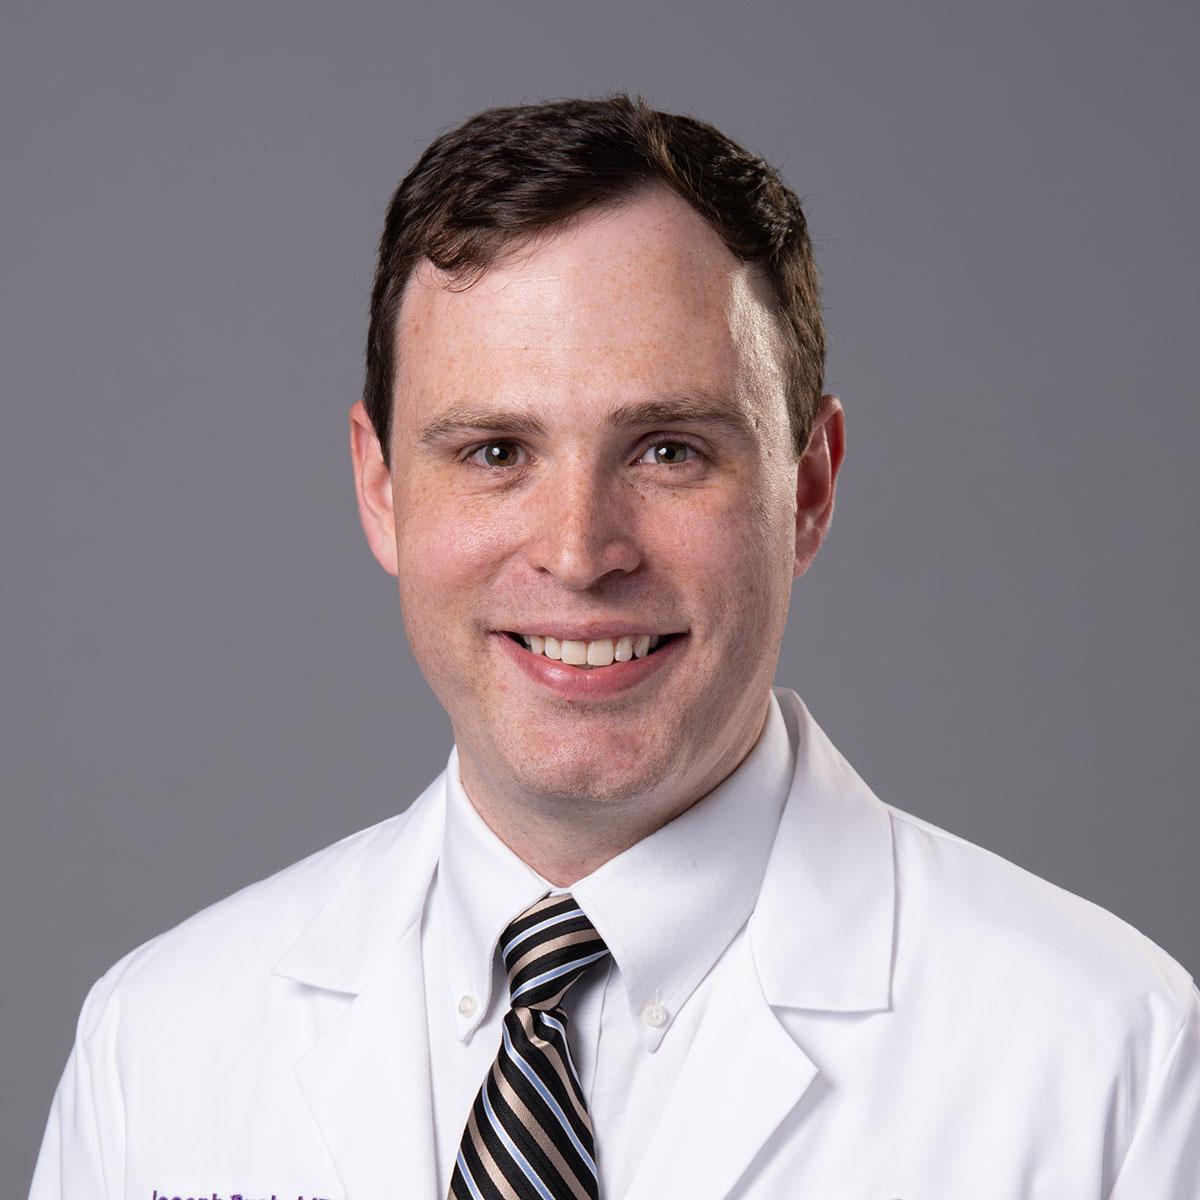 A friendly headshot of Dr. Joseph Bush